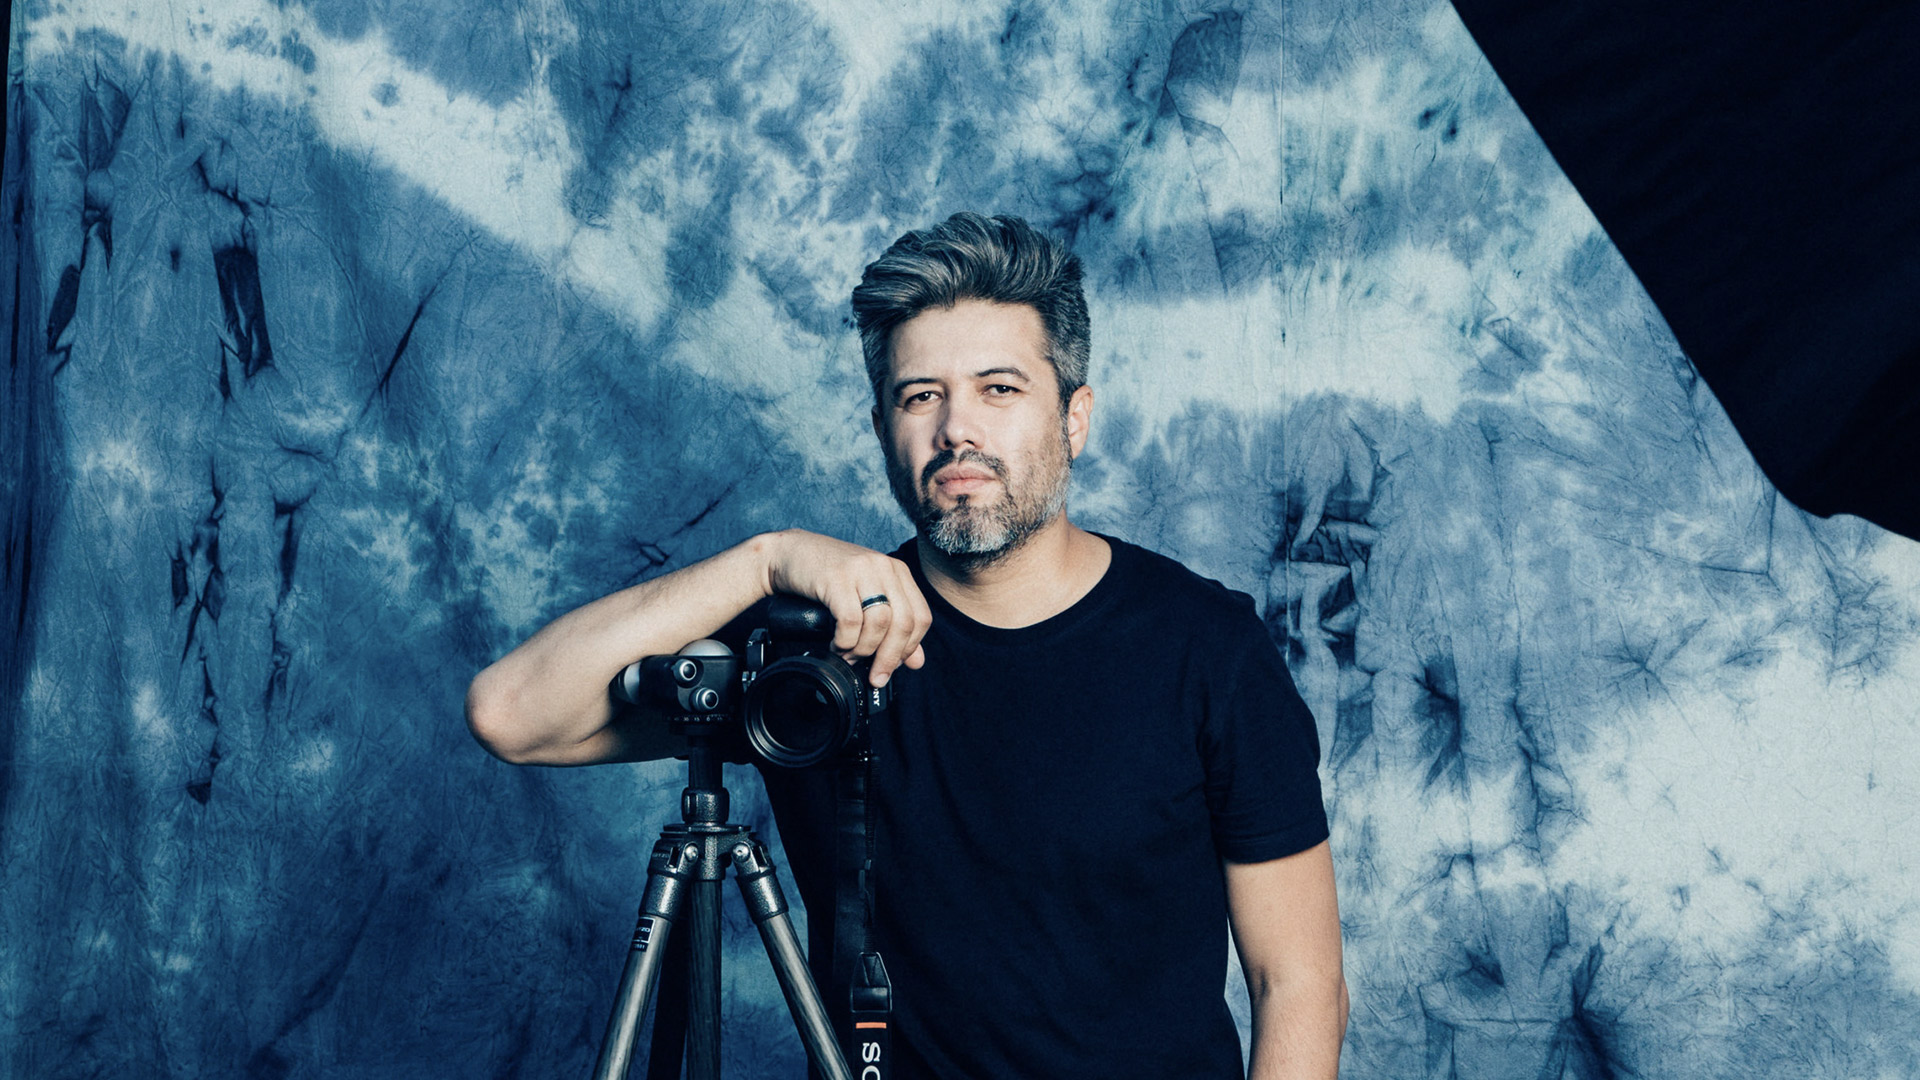 alboom-entrevista-fotografo-everton-rosa